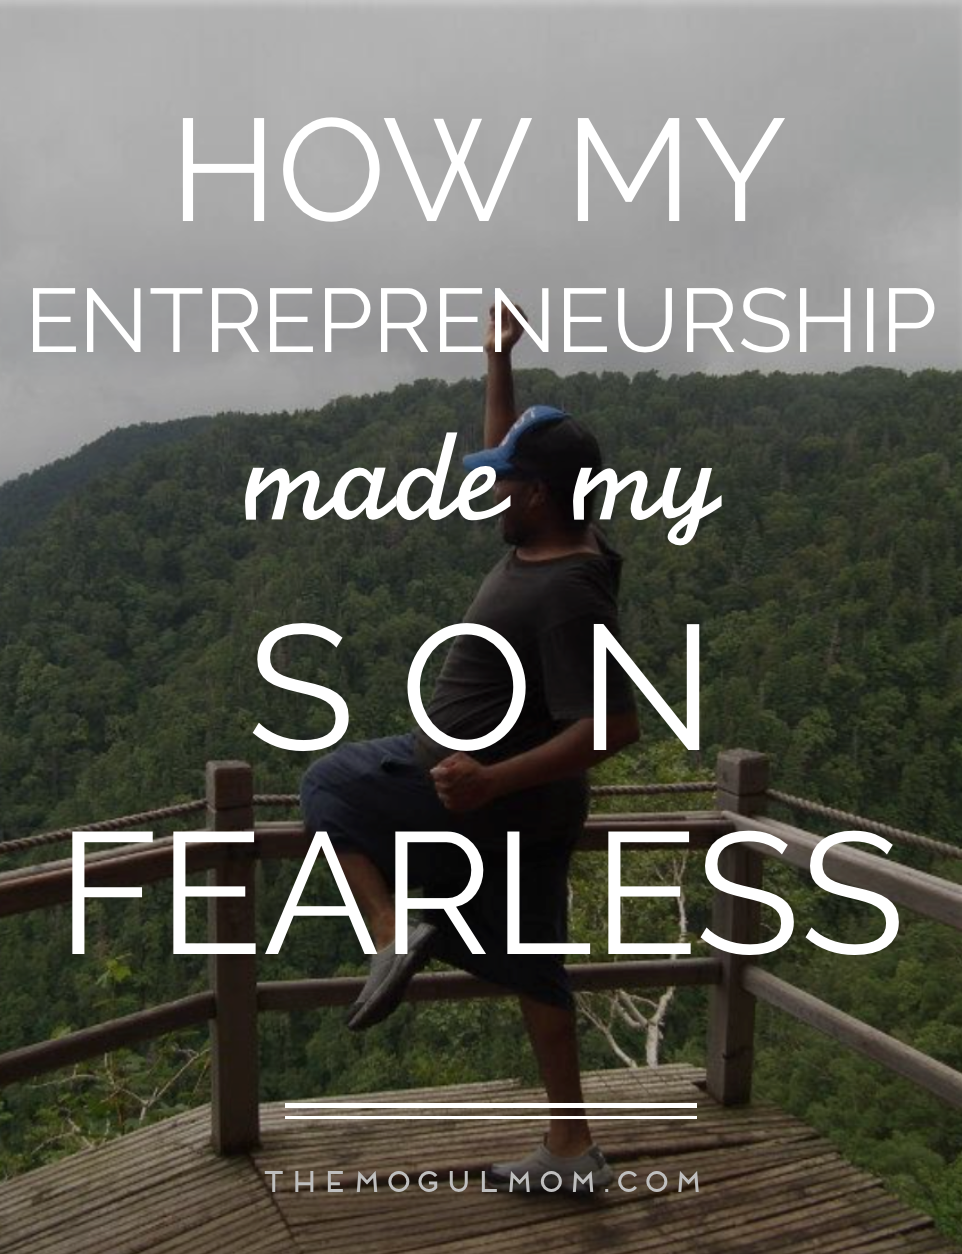 My Entrepreneurship Made My Son Fearless